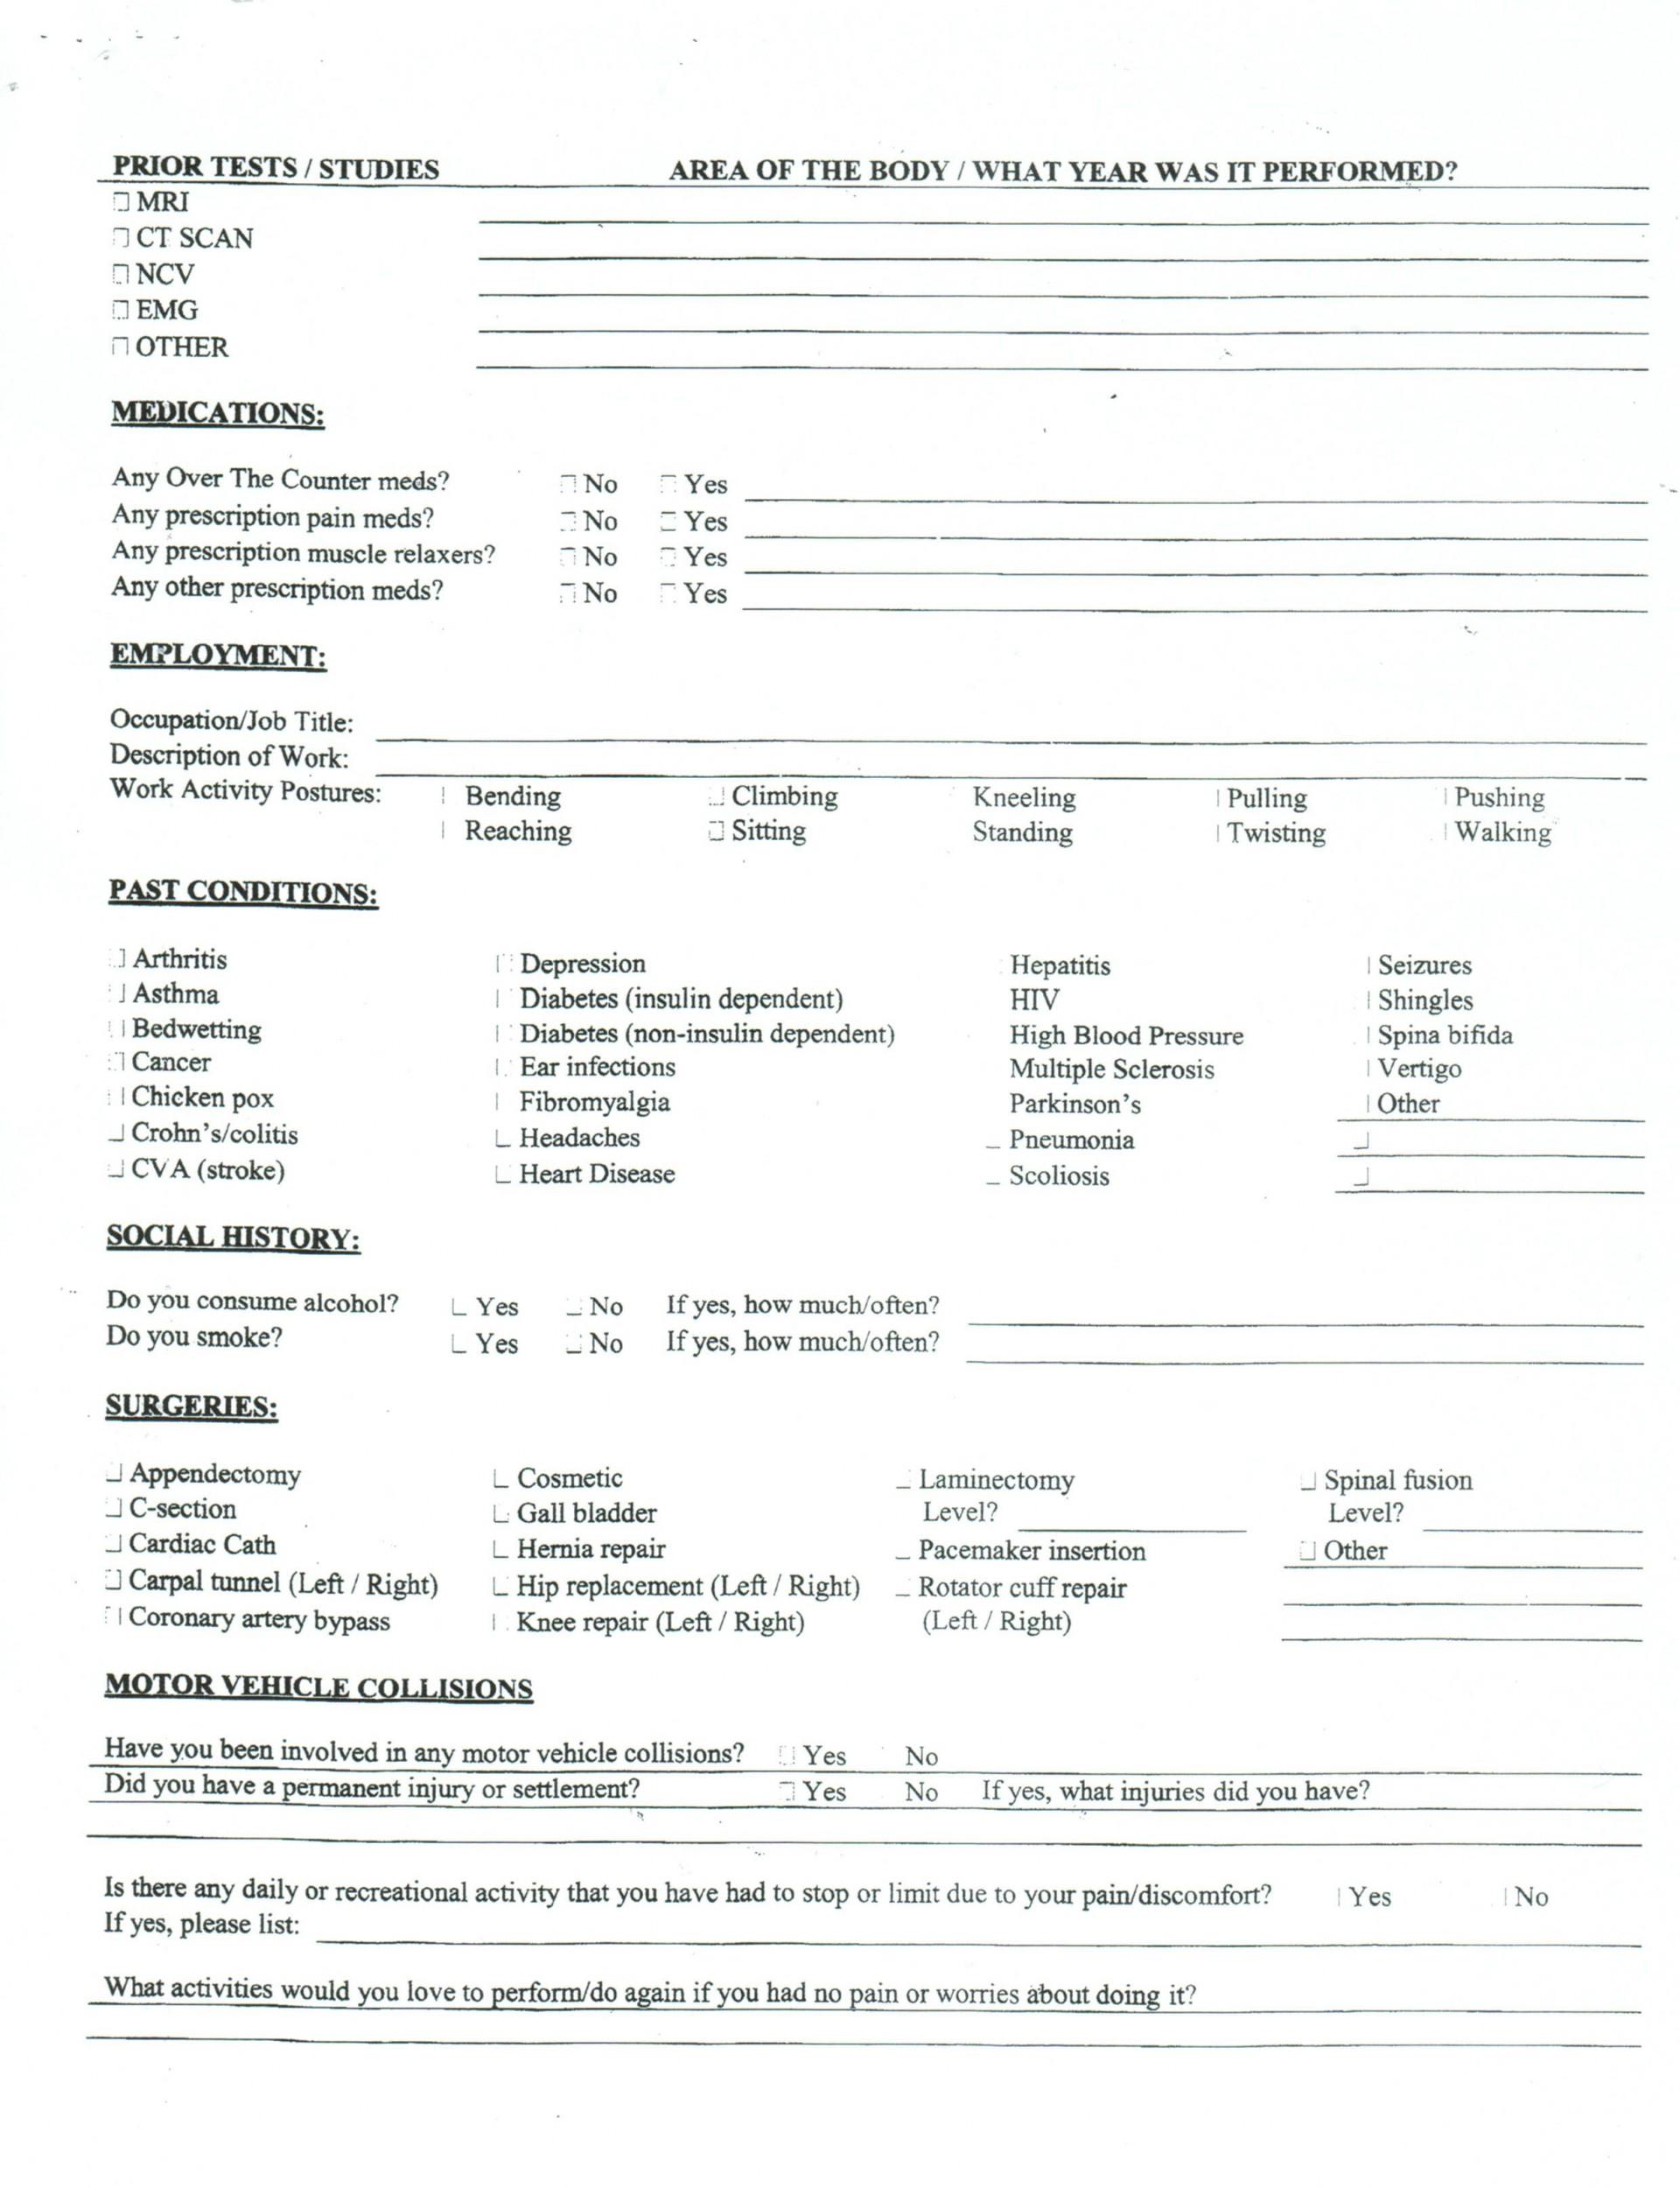 004 Shocking Patient Intake Form Template Design  Word Client Excel Pdf1920